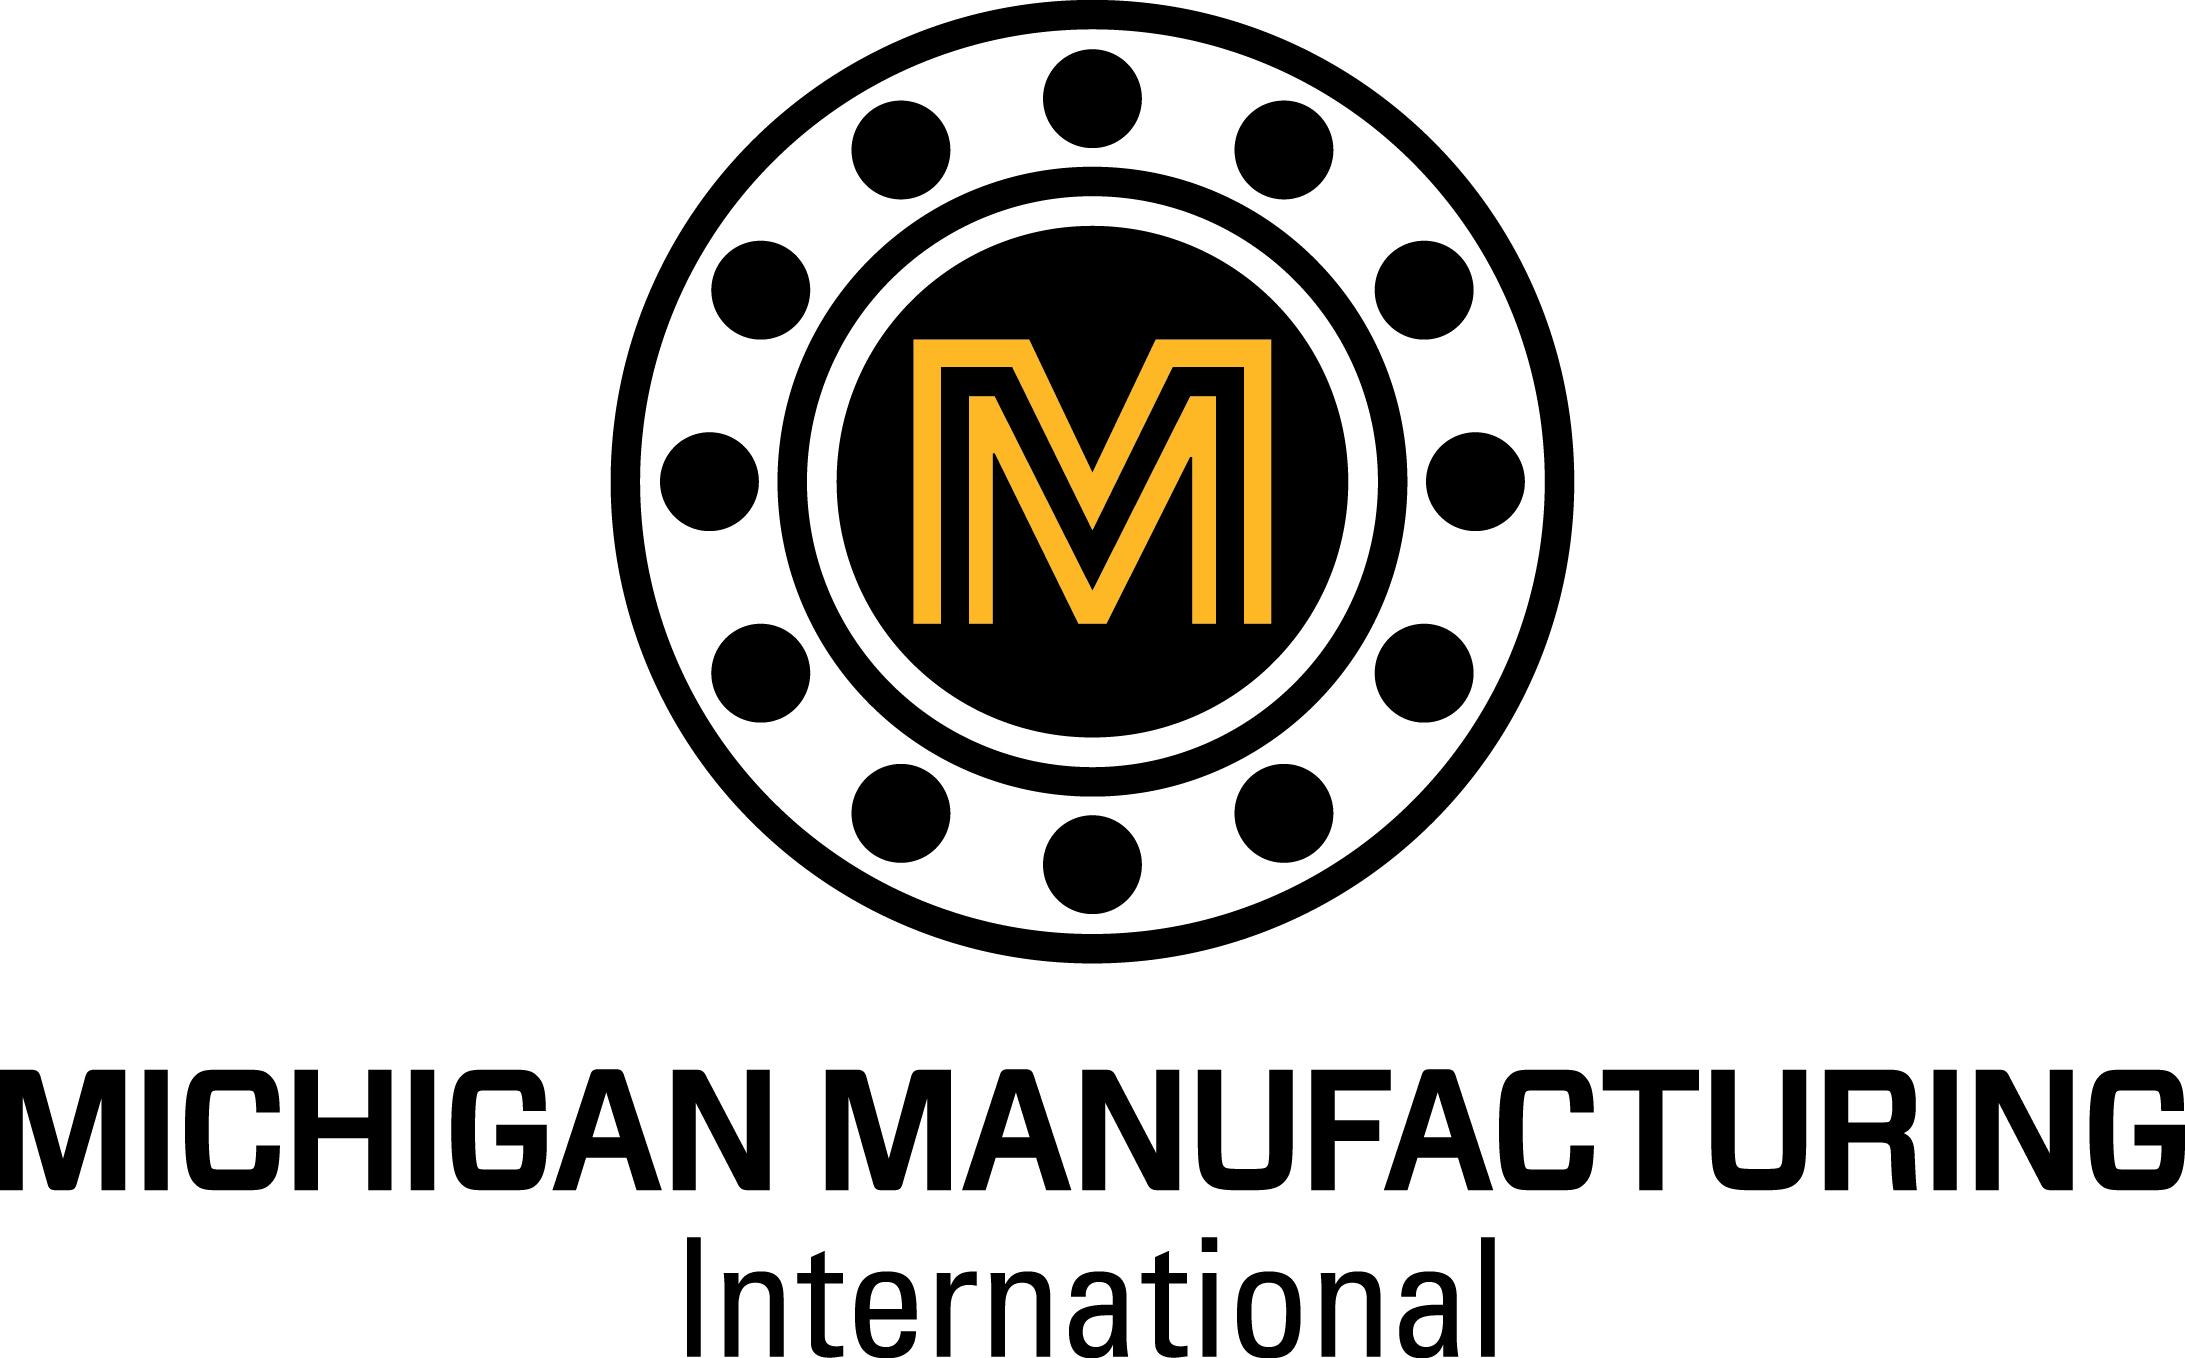 Michigan Manufacturing International (MMI) Celebrates 25